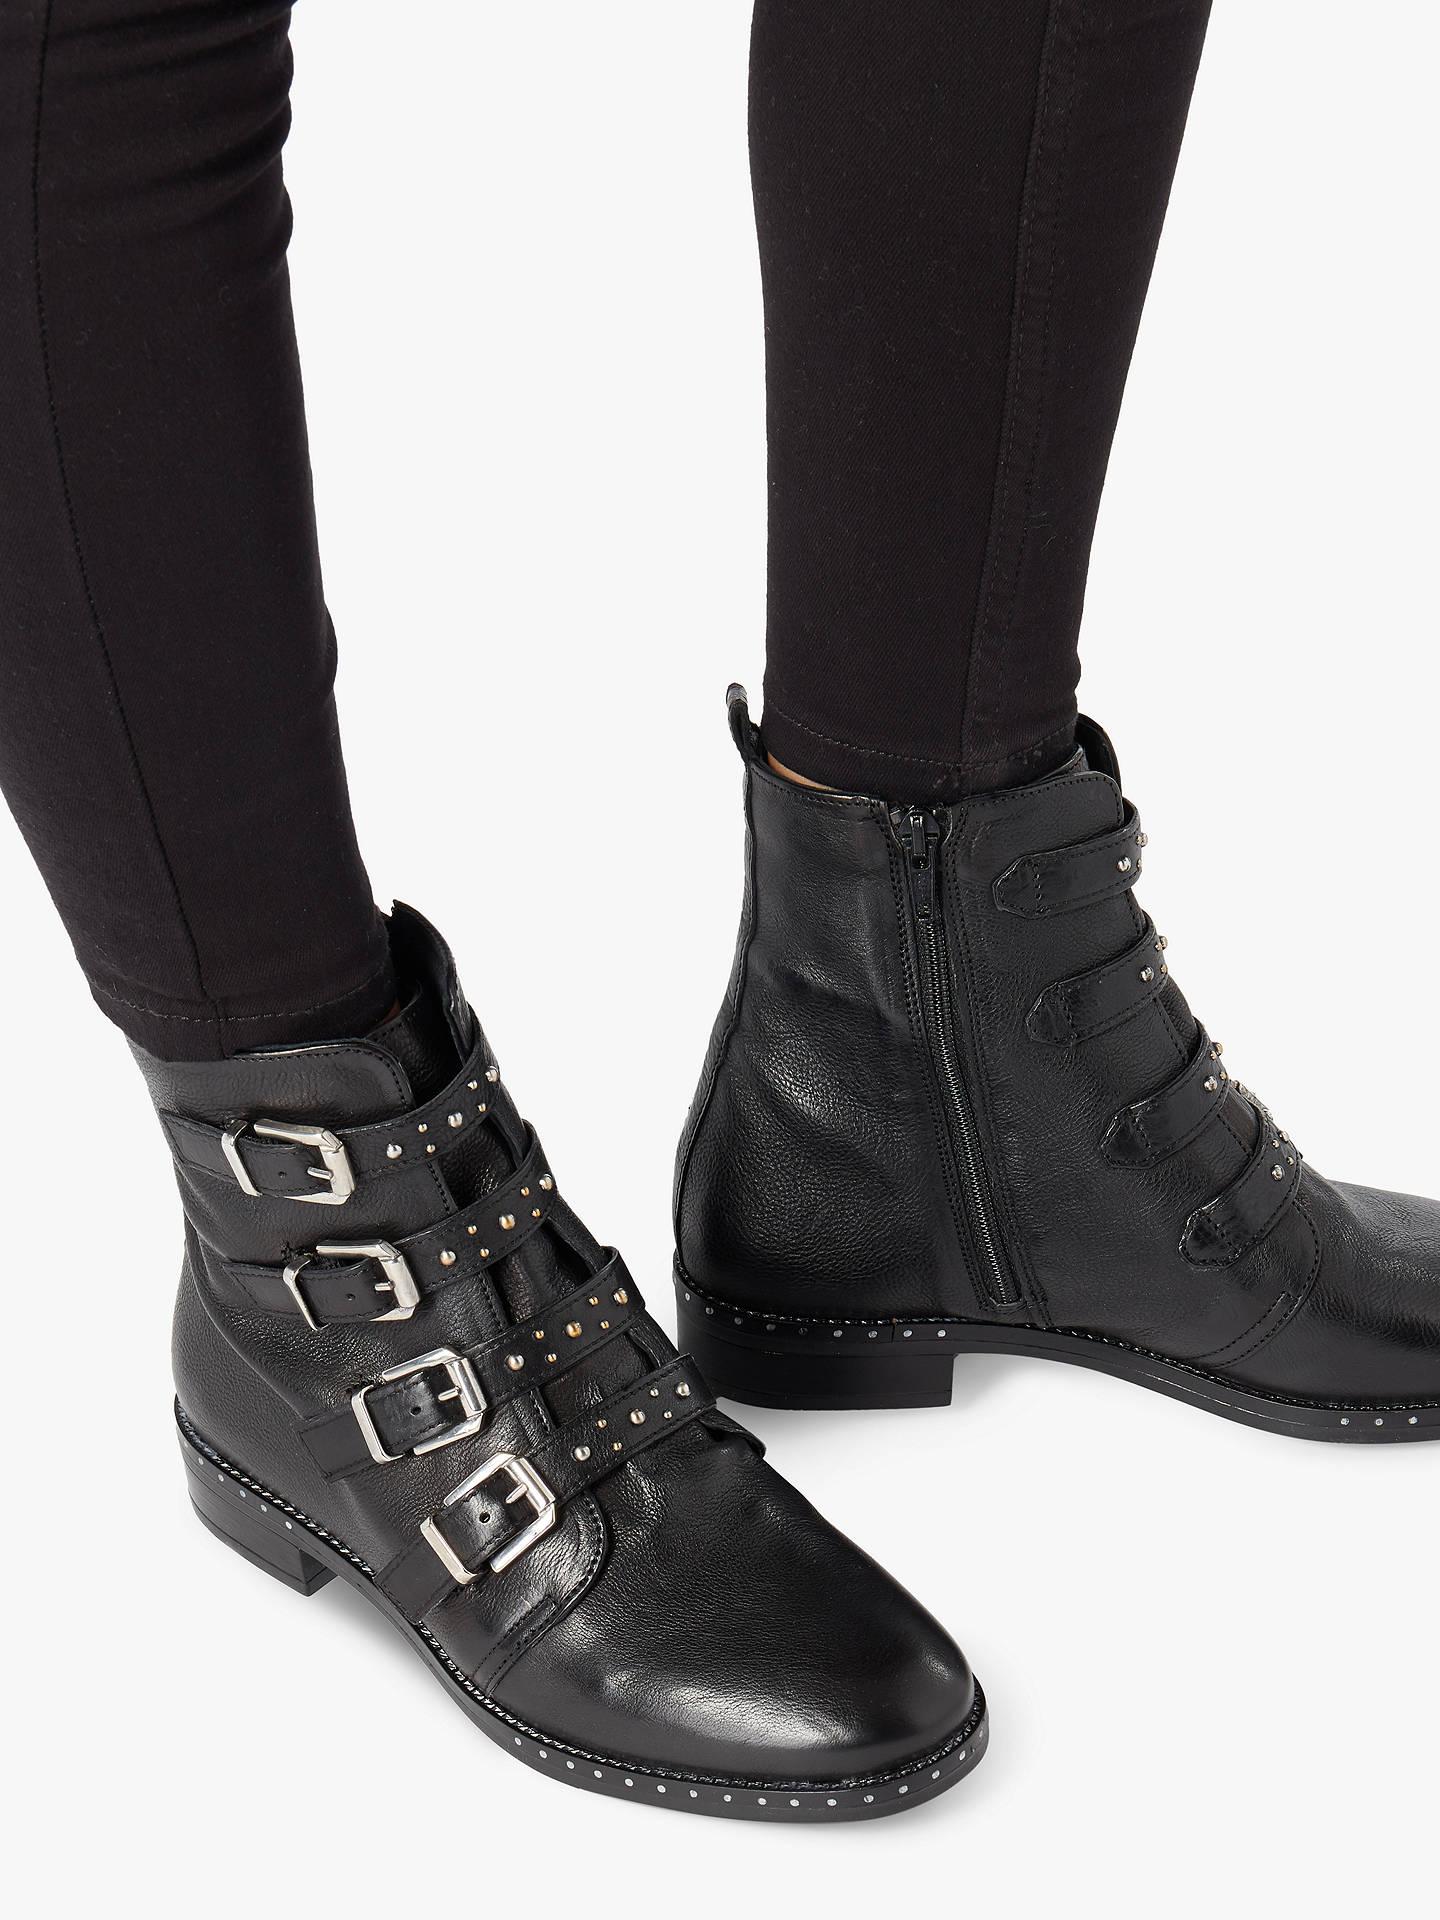 09d2162603c ... Buy Dune Pixxel Studded Ankle Boots